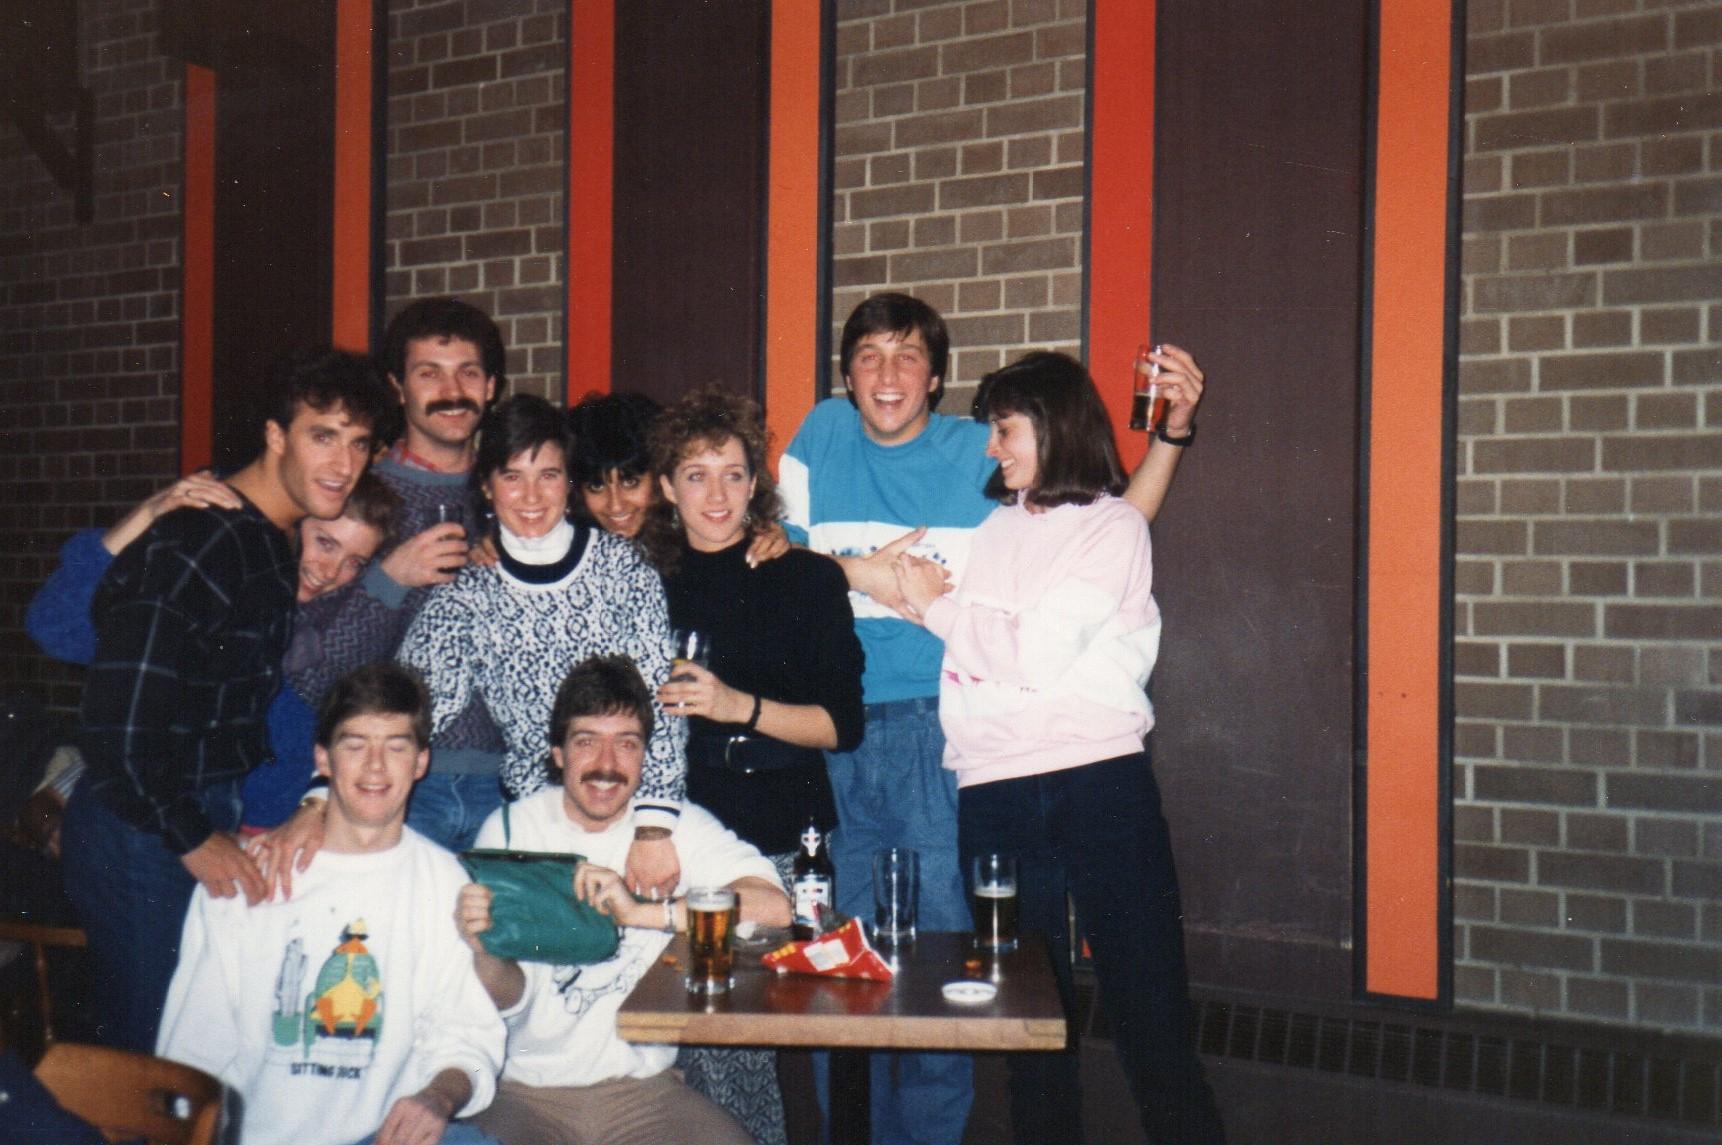 class of 1990 optometry vision science university of waterloo